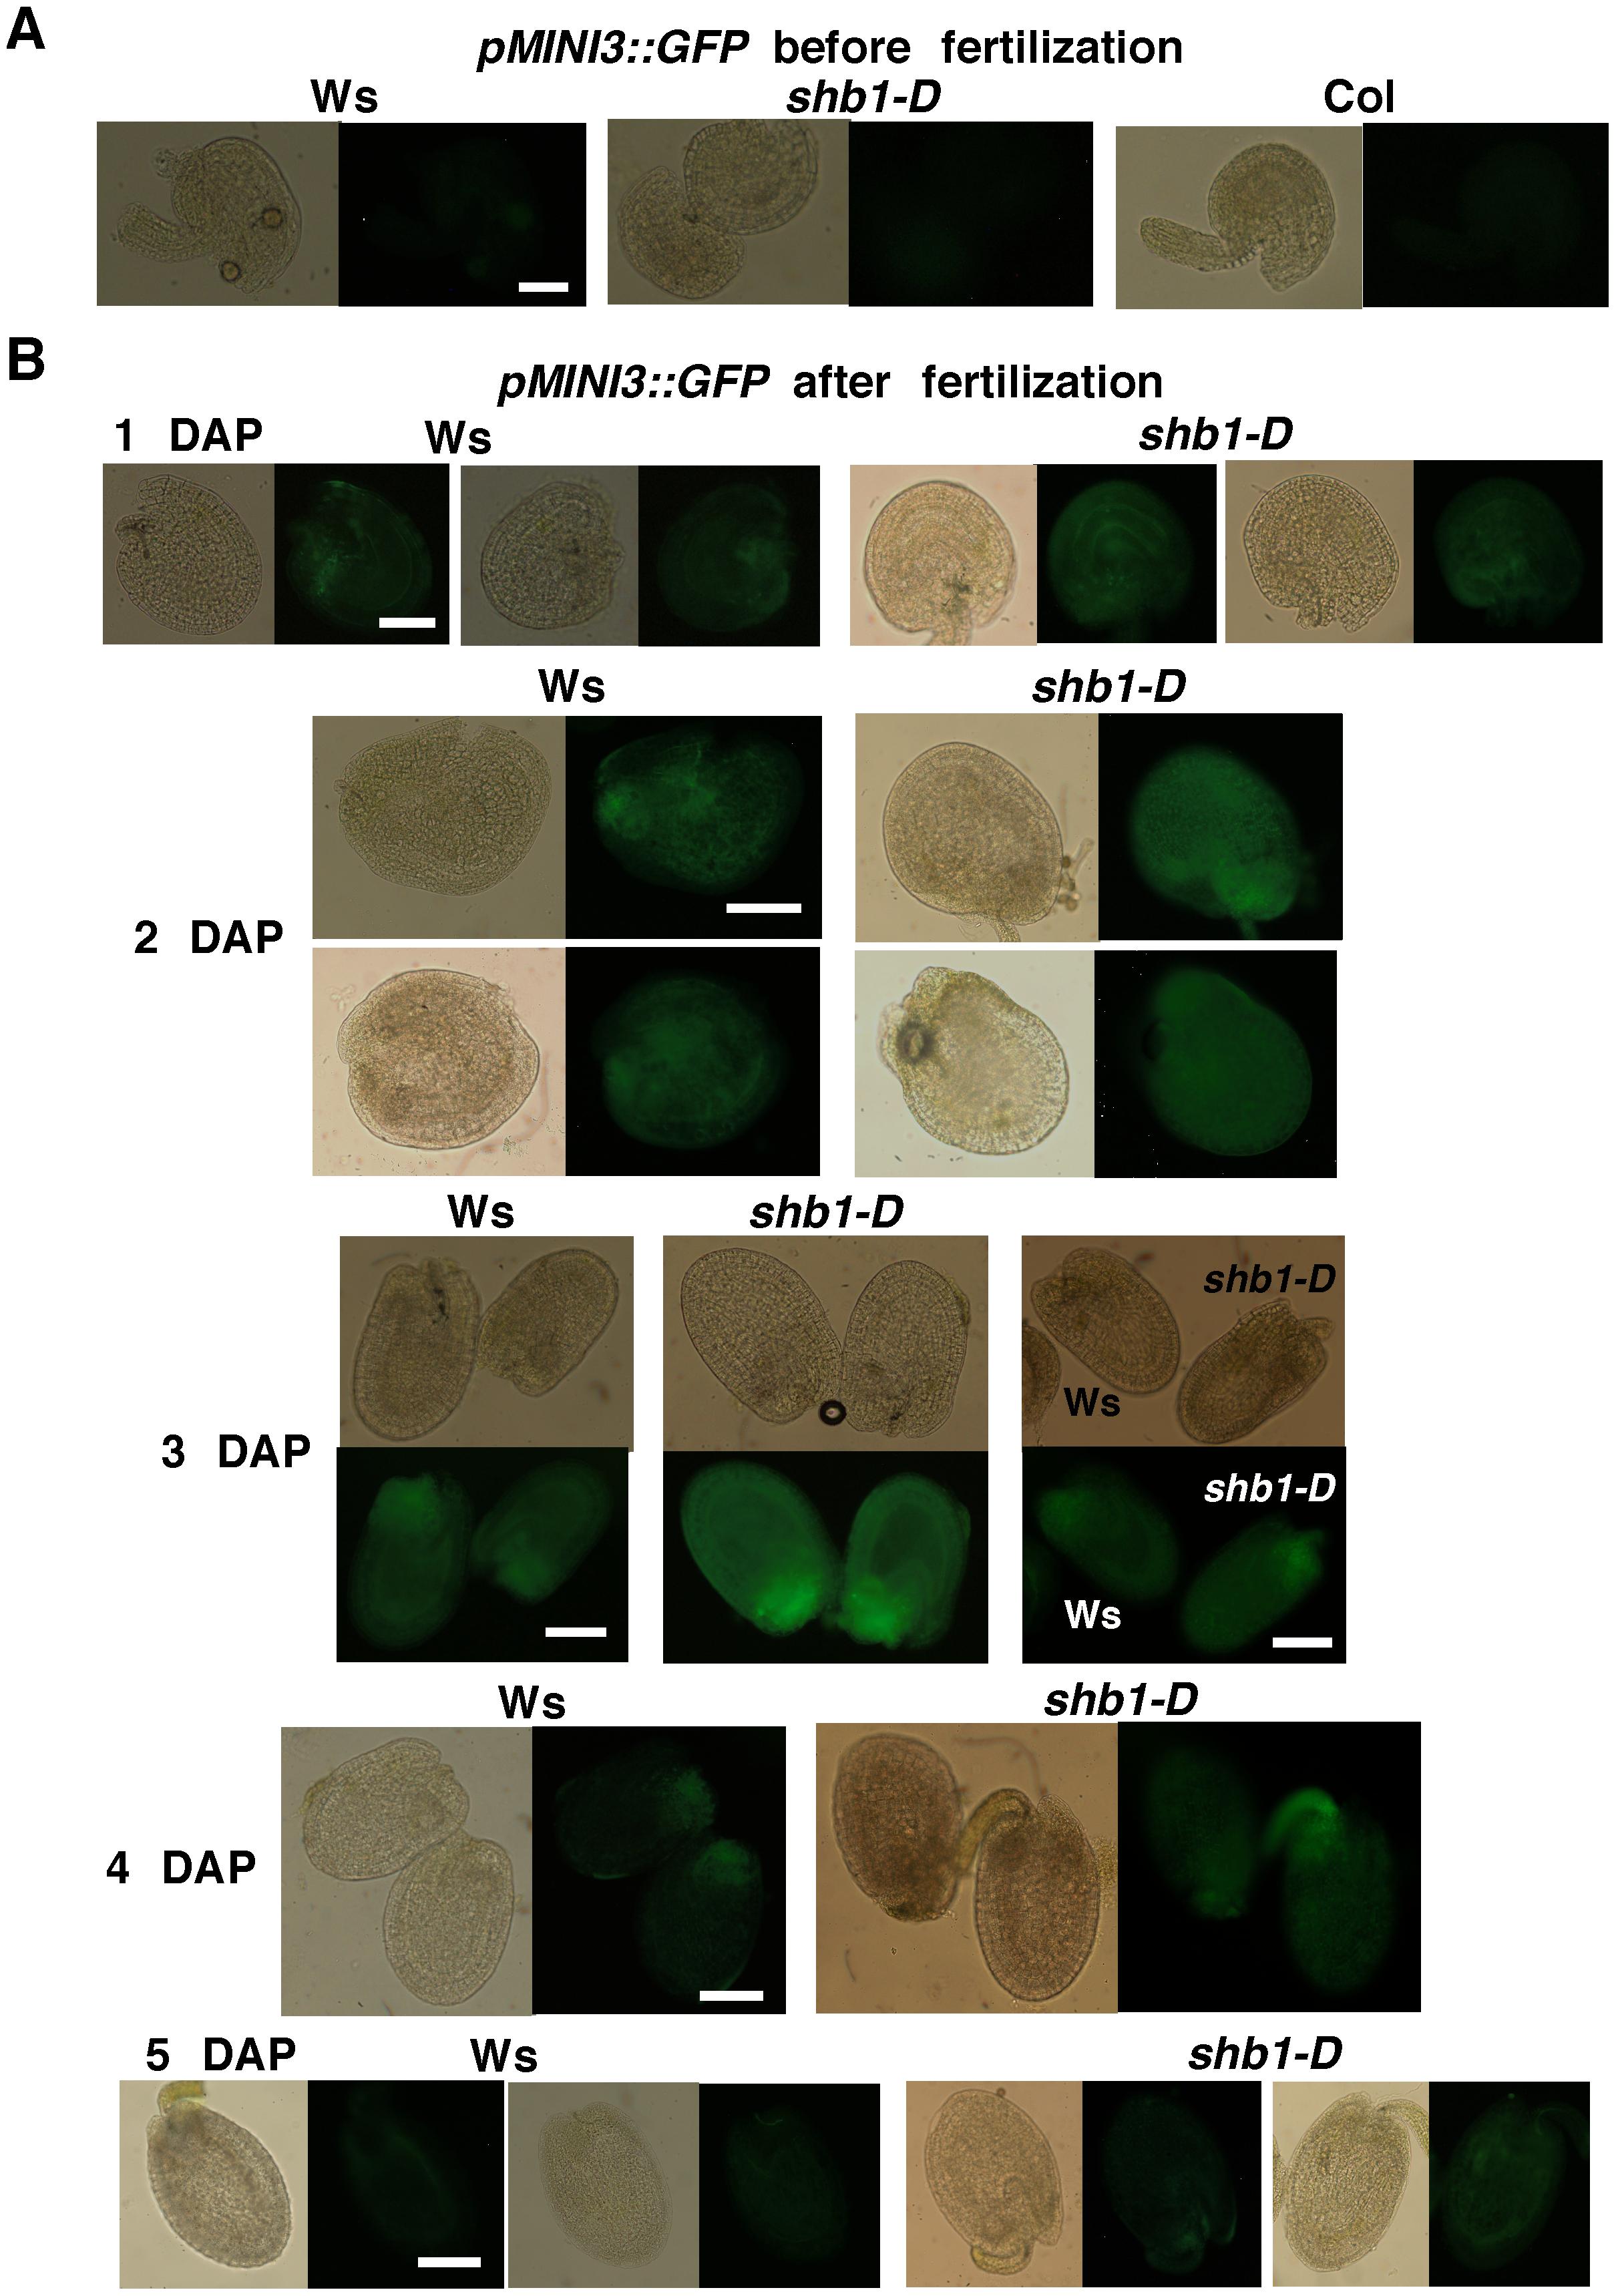 SHB1 regulates the expression of <i>pMINI3::GFP</i>.